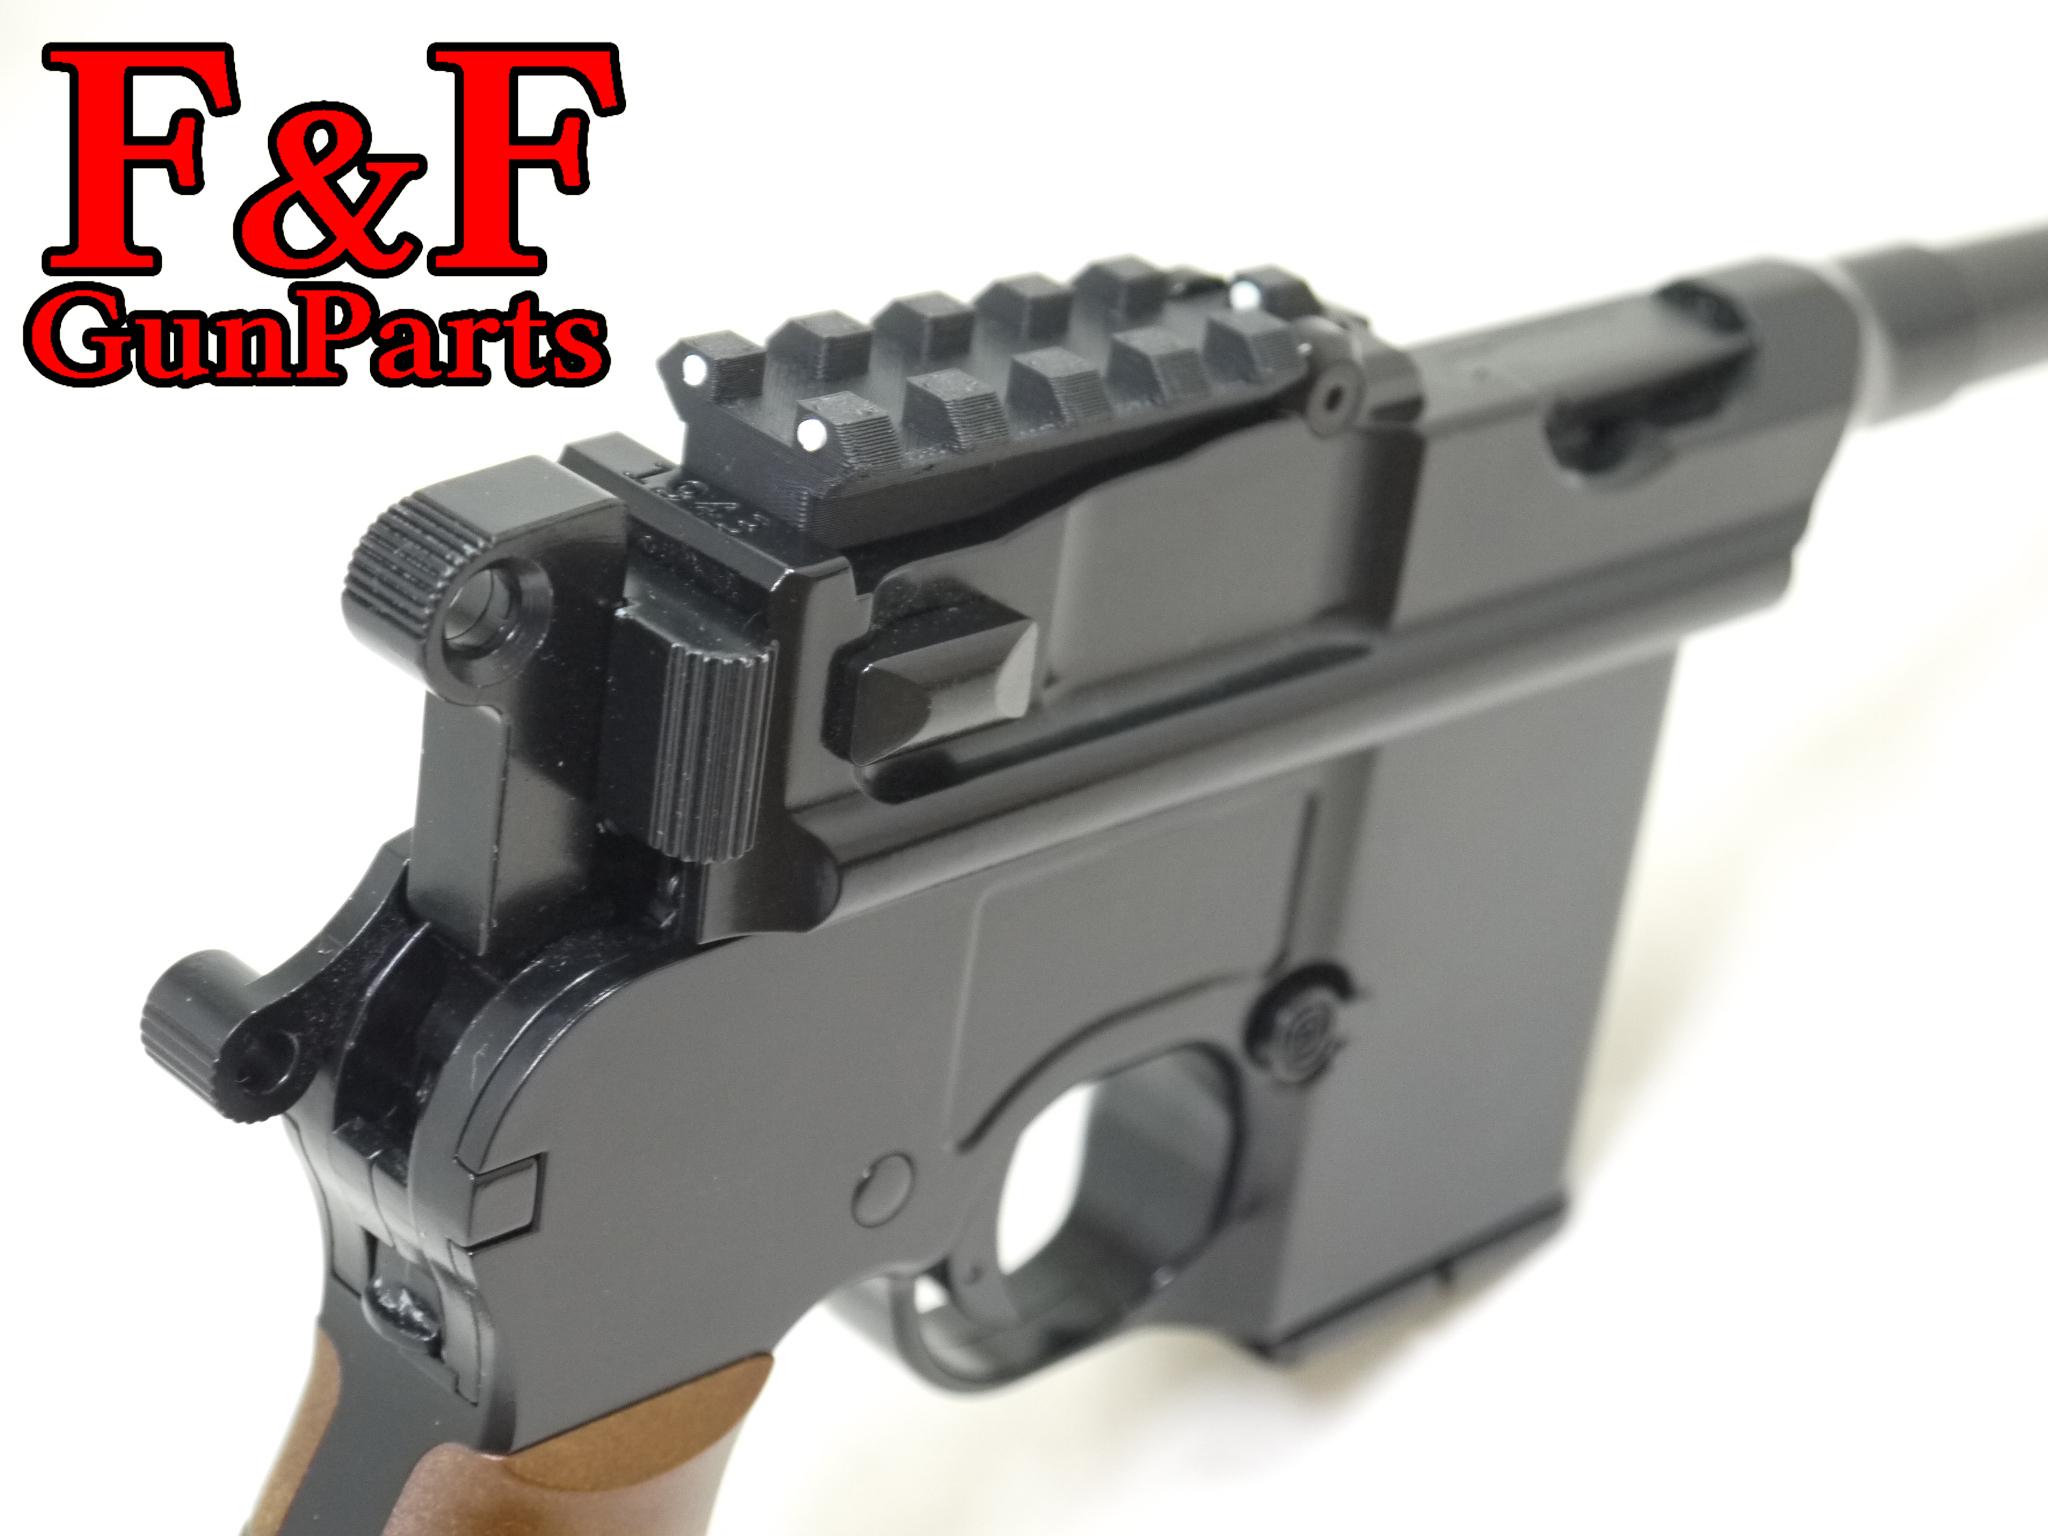 AW/WE M712対応 ナイトサイト付20mmレール | F&F GunParts powered by BASE